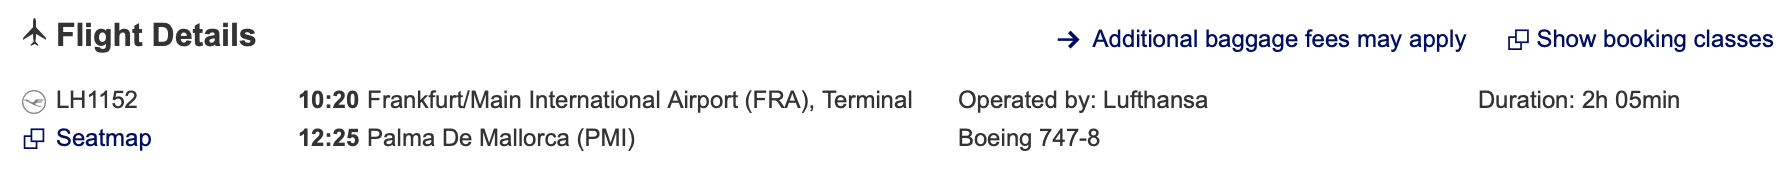 Frankfurt to Mallorca Lufthansa flight details